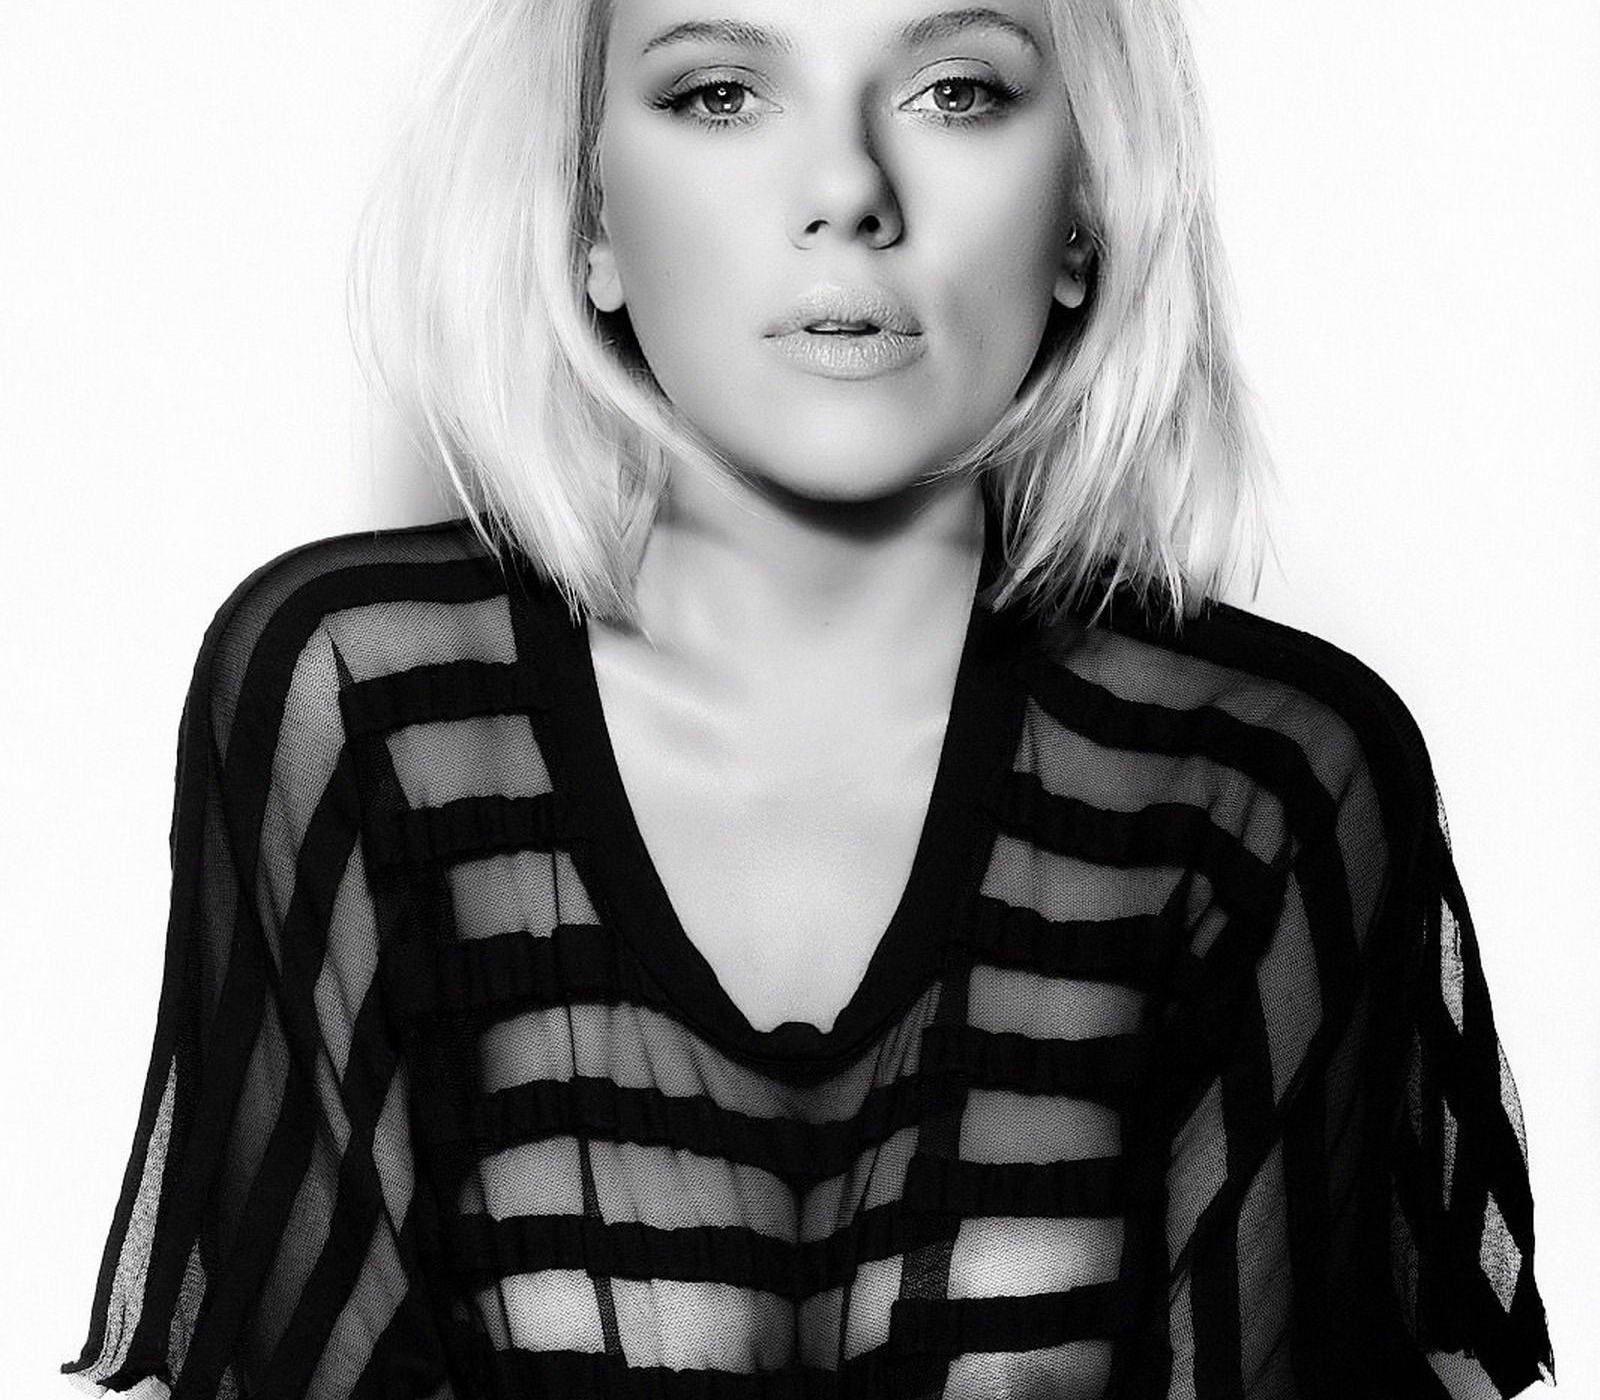 Scarlett johansson see through